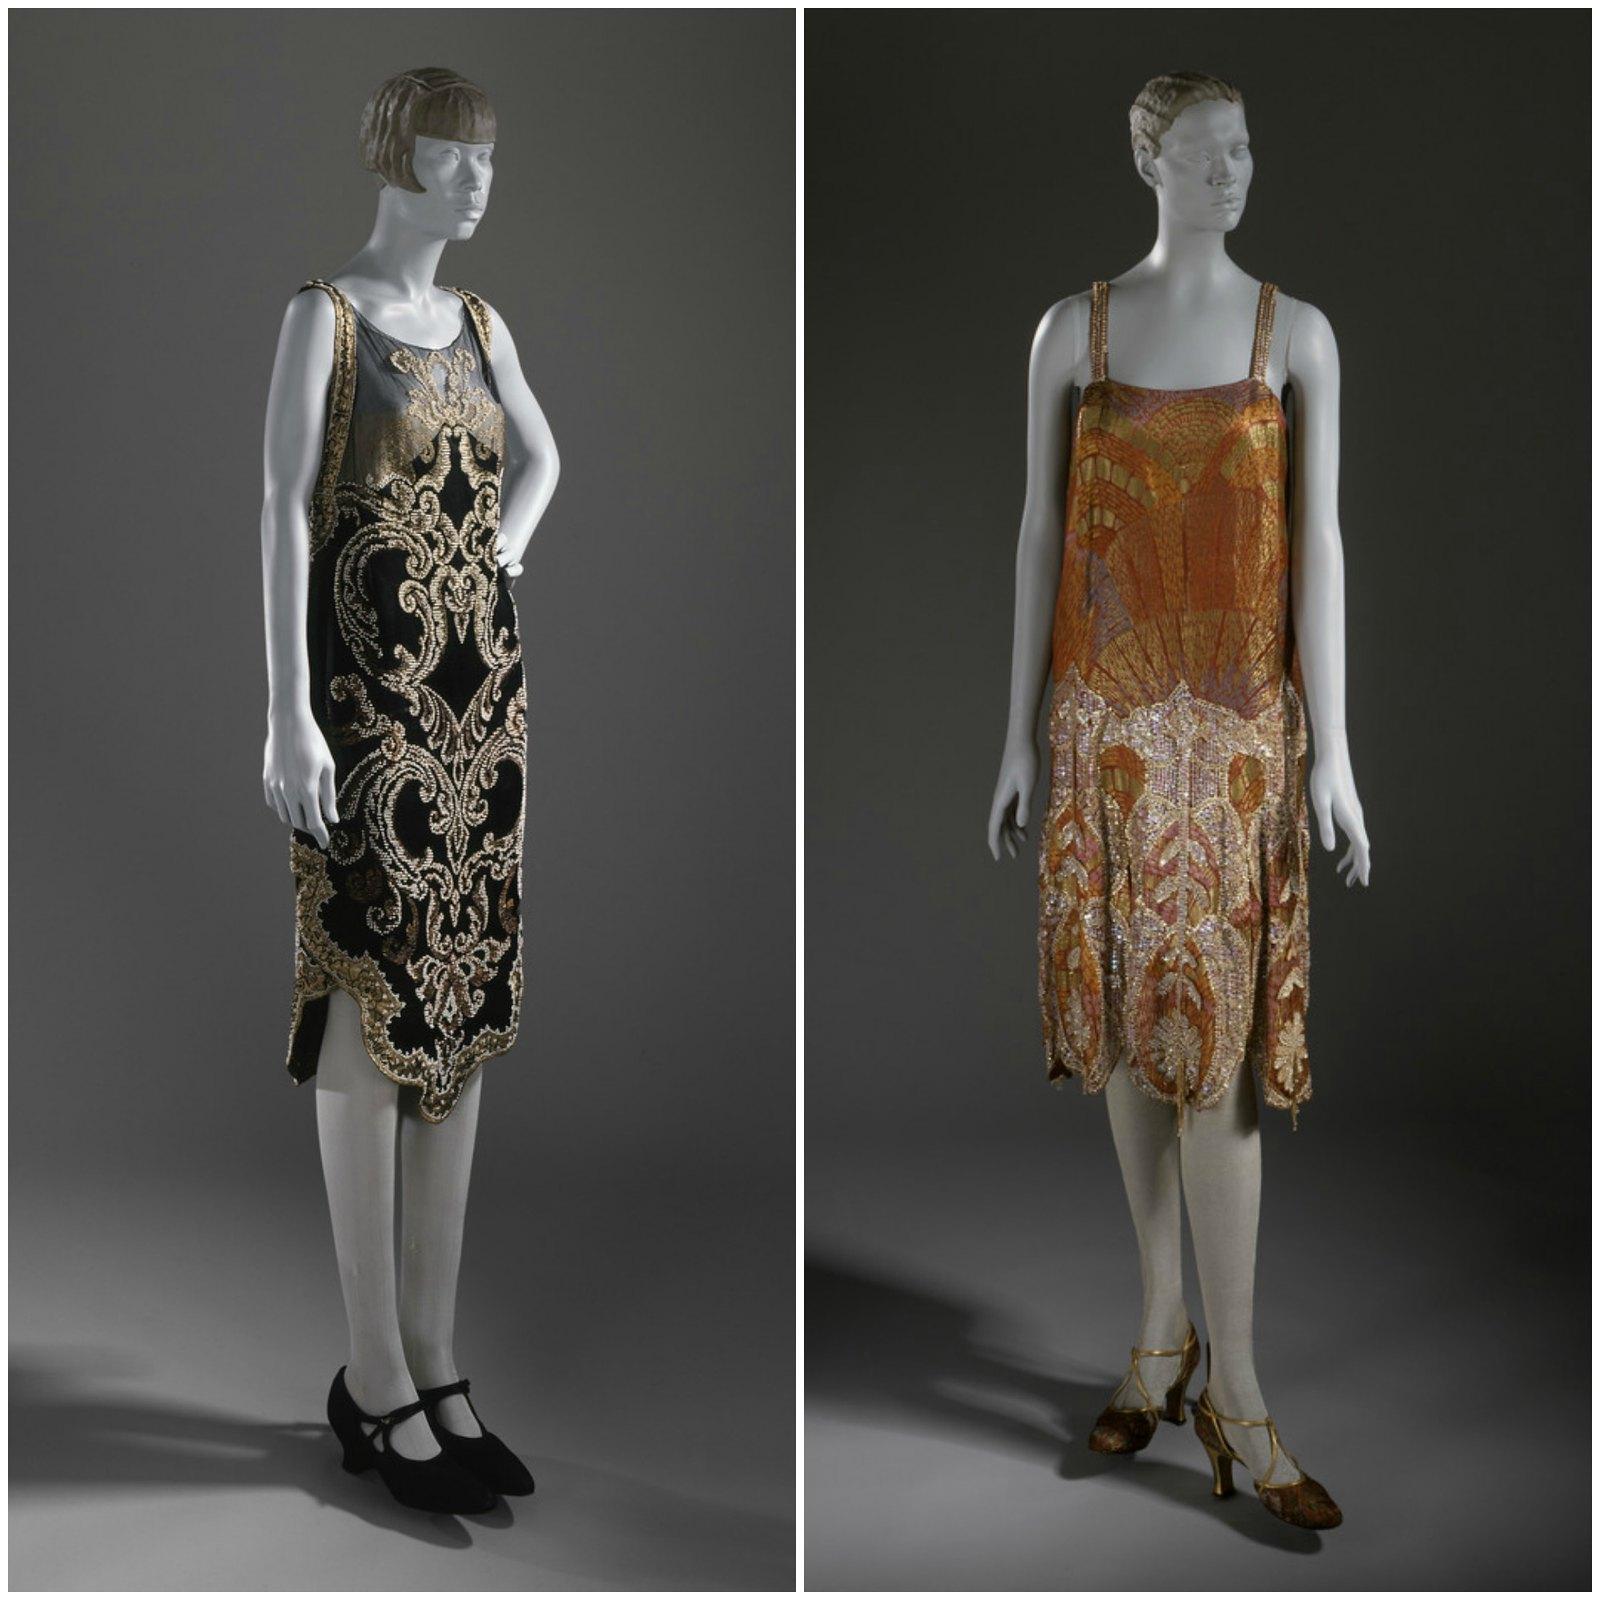 1926. Women's dresses. Callot Soeurs. LACMA